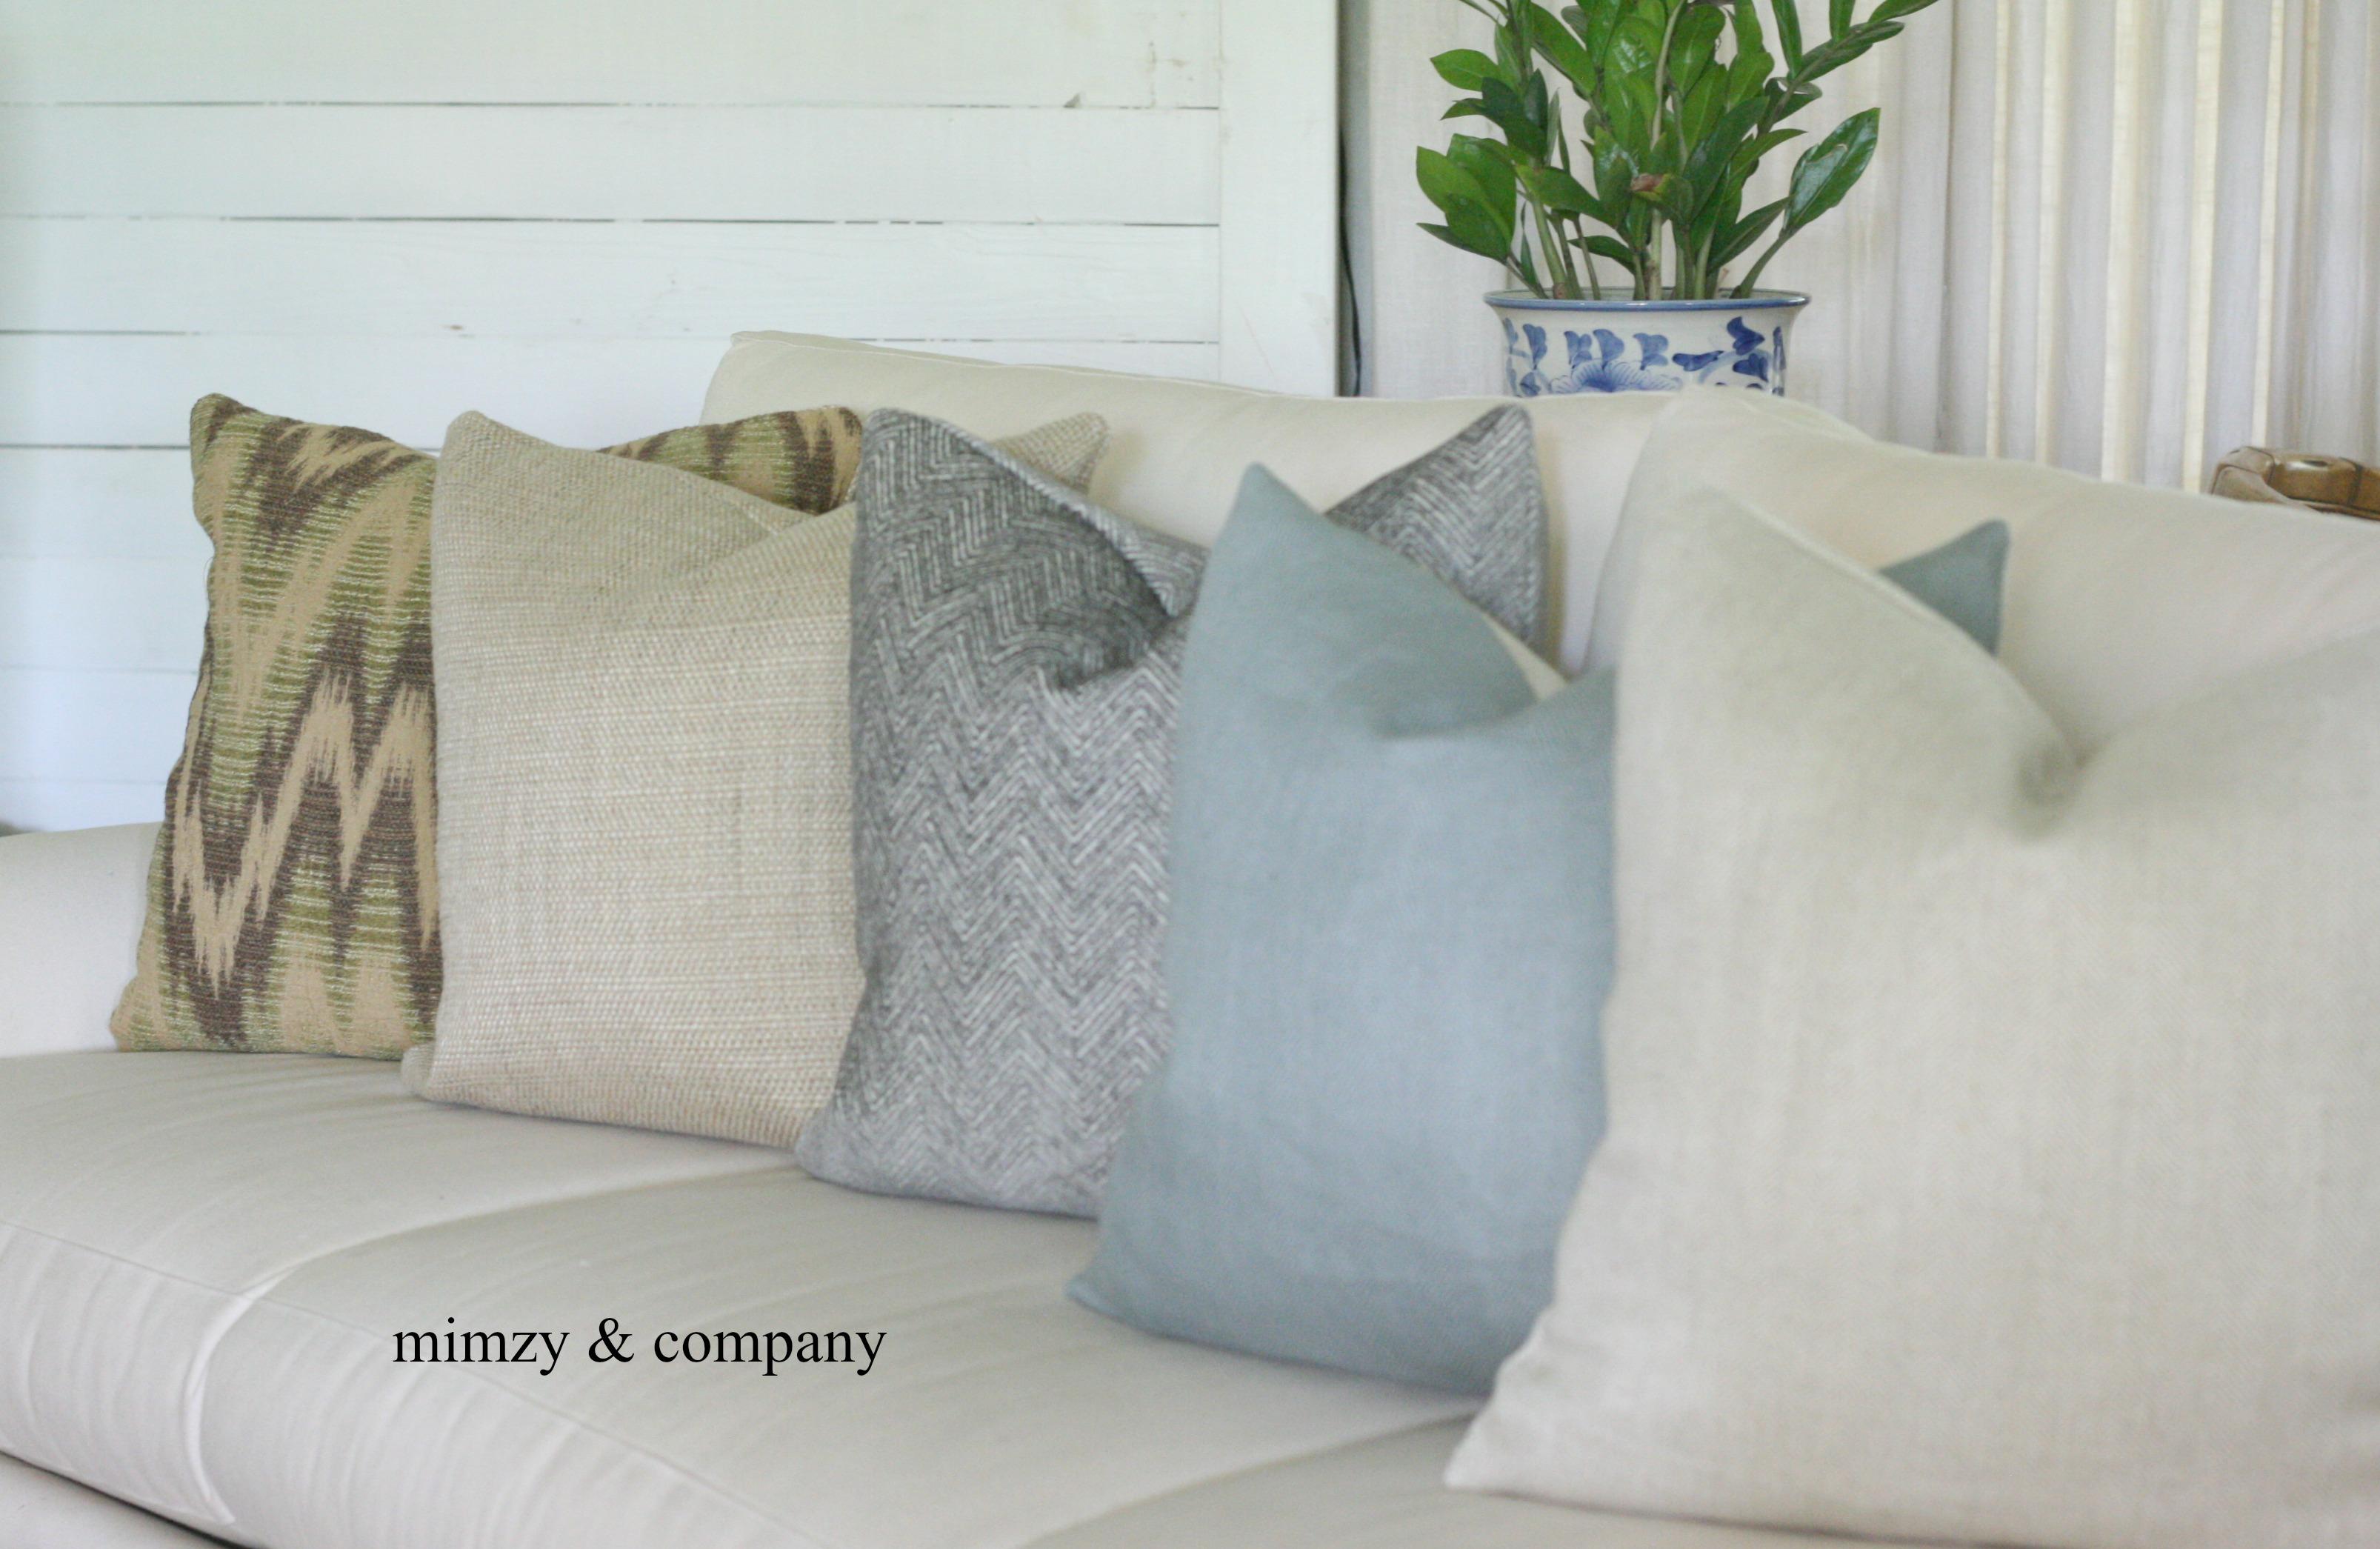 rowley company pillow template archives mimzy company